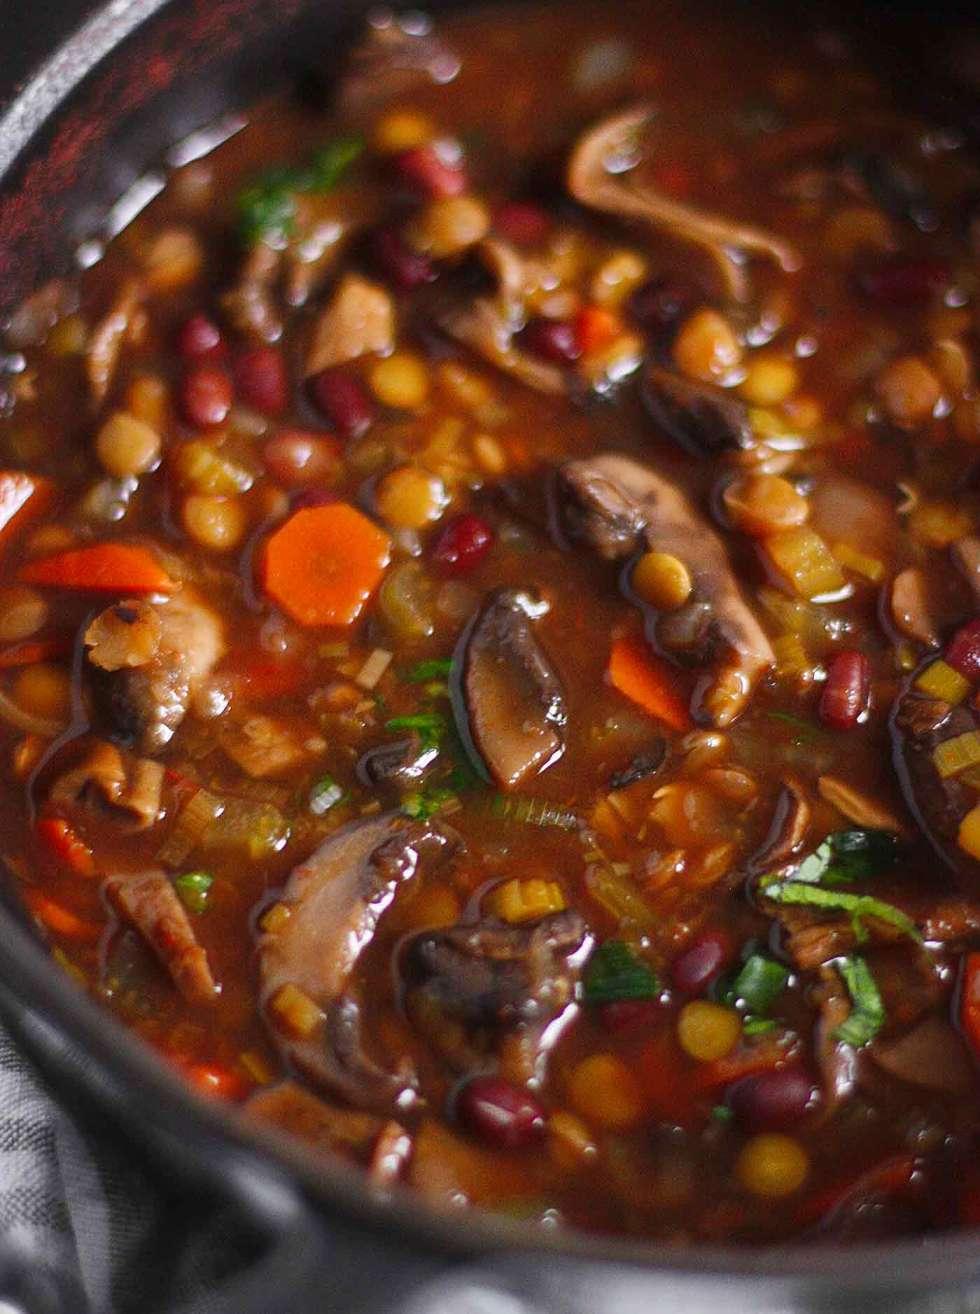 Close-up of Mushroom Lentil Mushroom Soup in the pot